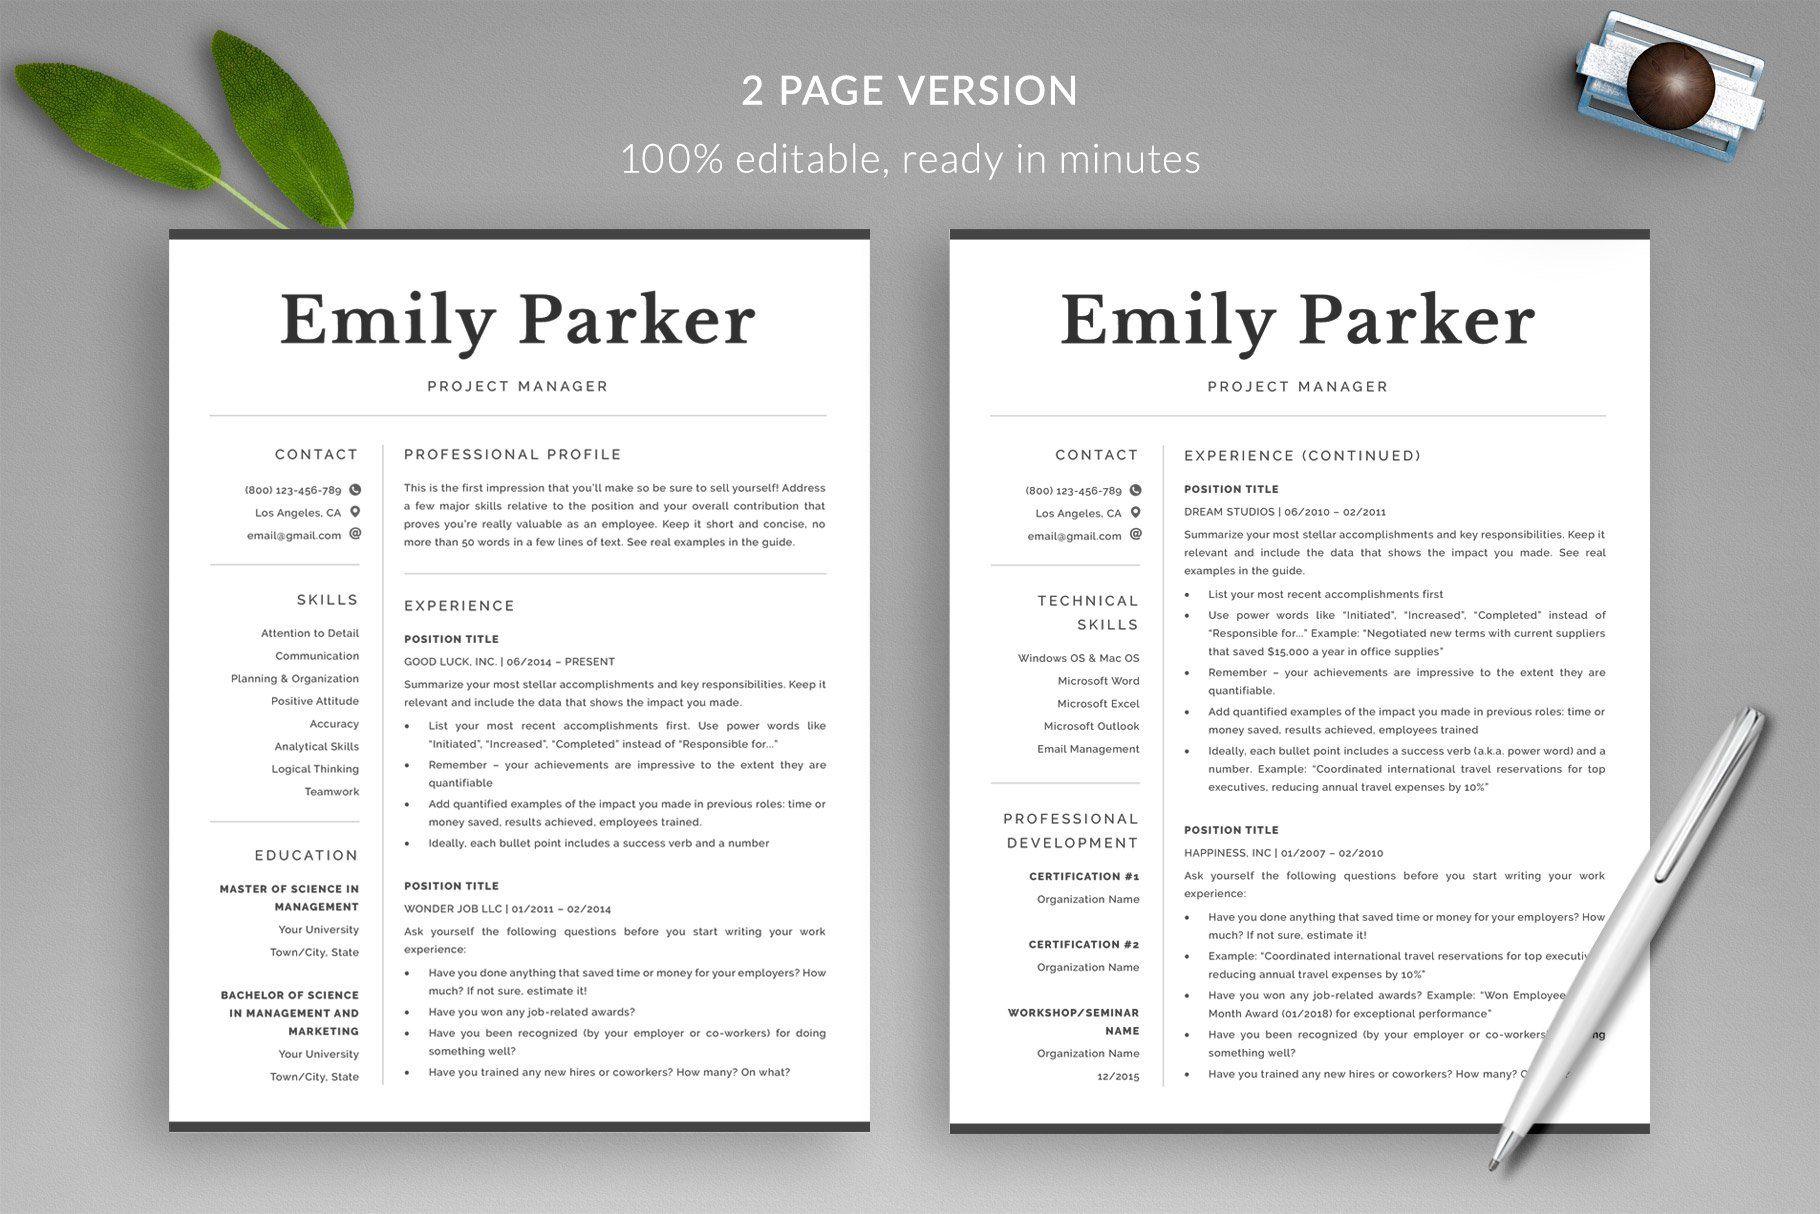 Resume Templates Resume Template Professional Resume Templates Resume Design Template